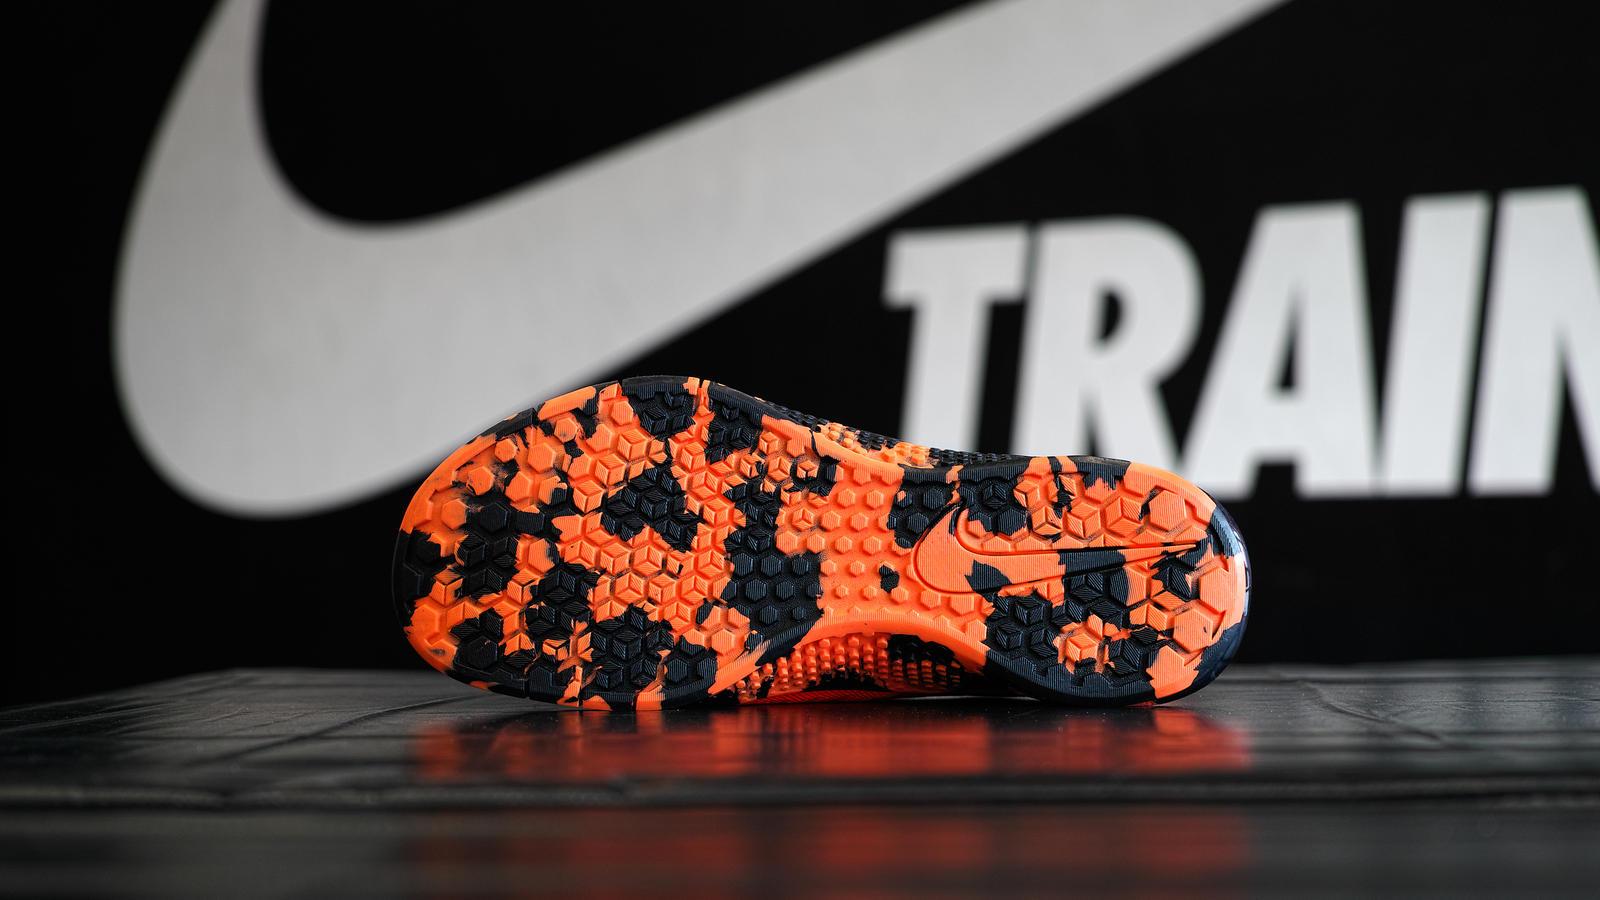 Nike Metcon 2 Amplify